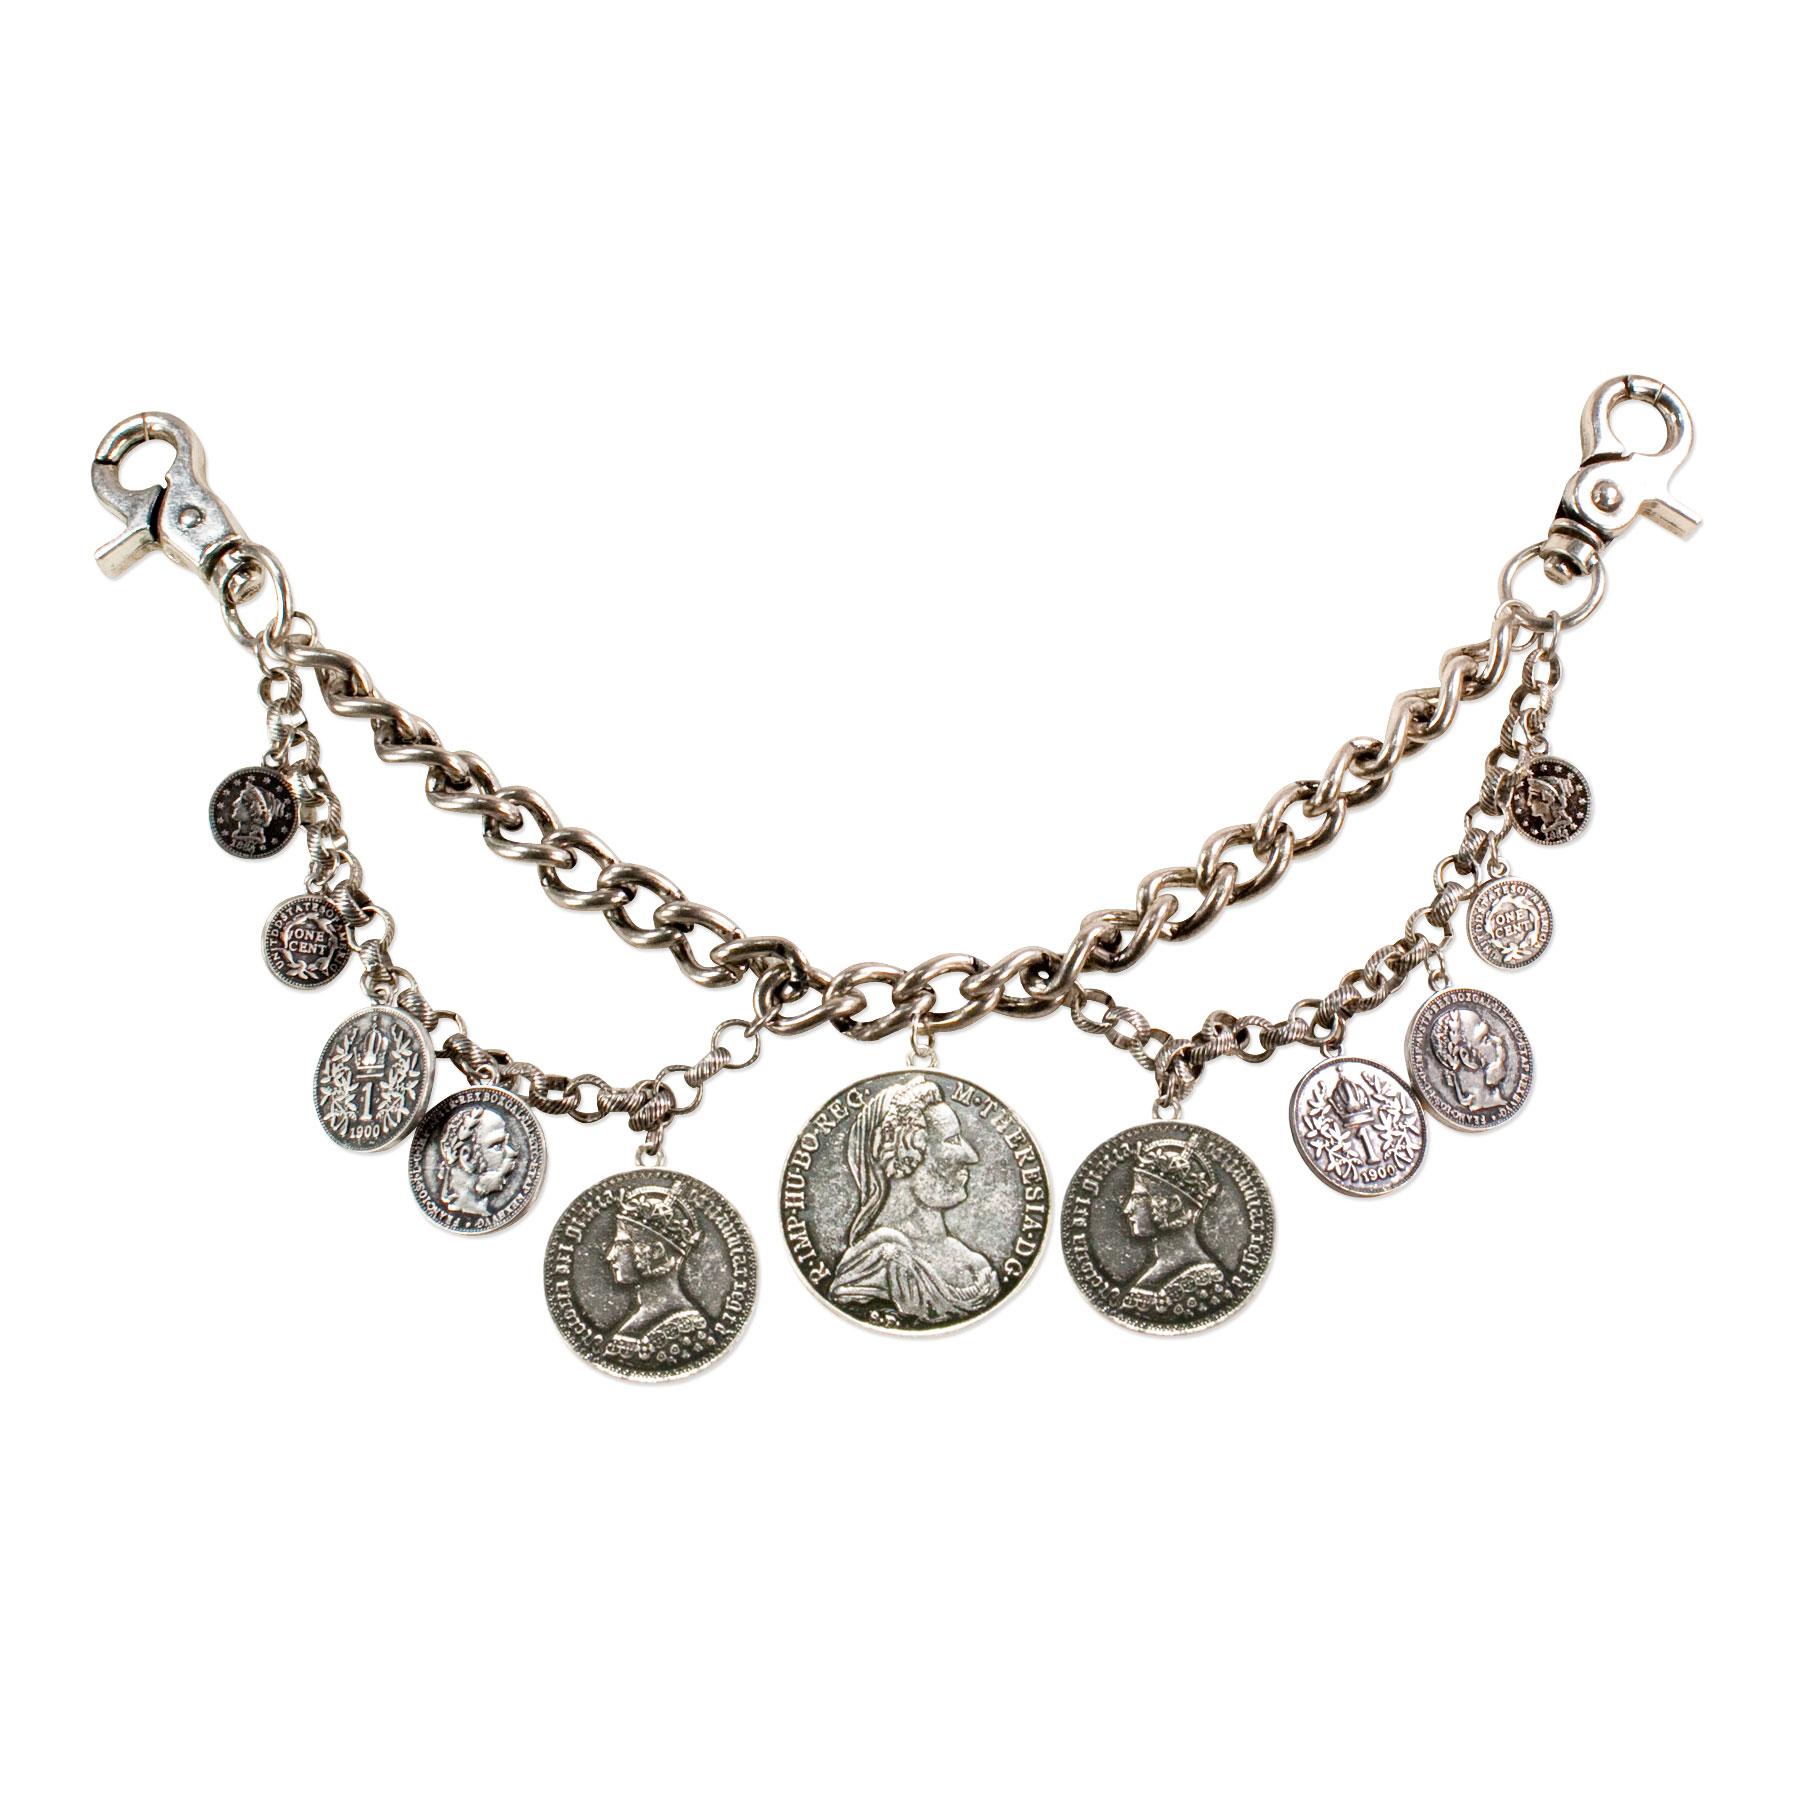 Charivari Münzen Antik Silber Farben Trachtenschmuck Herren